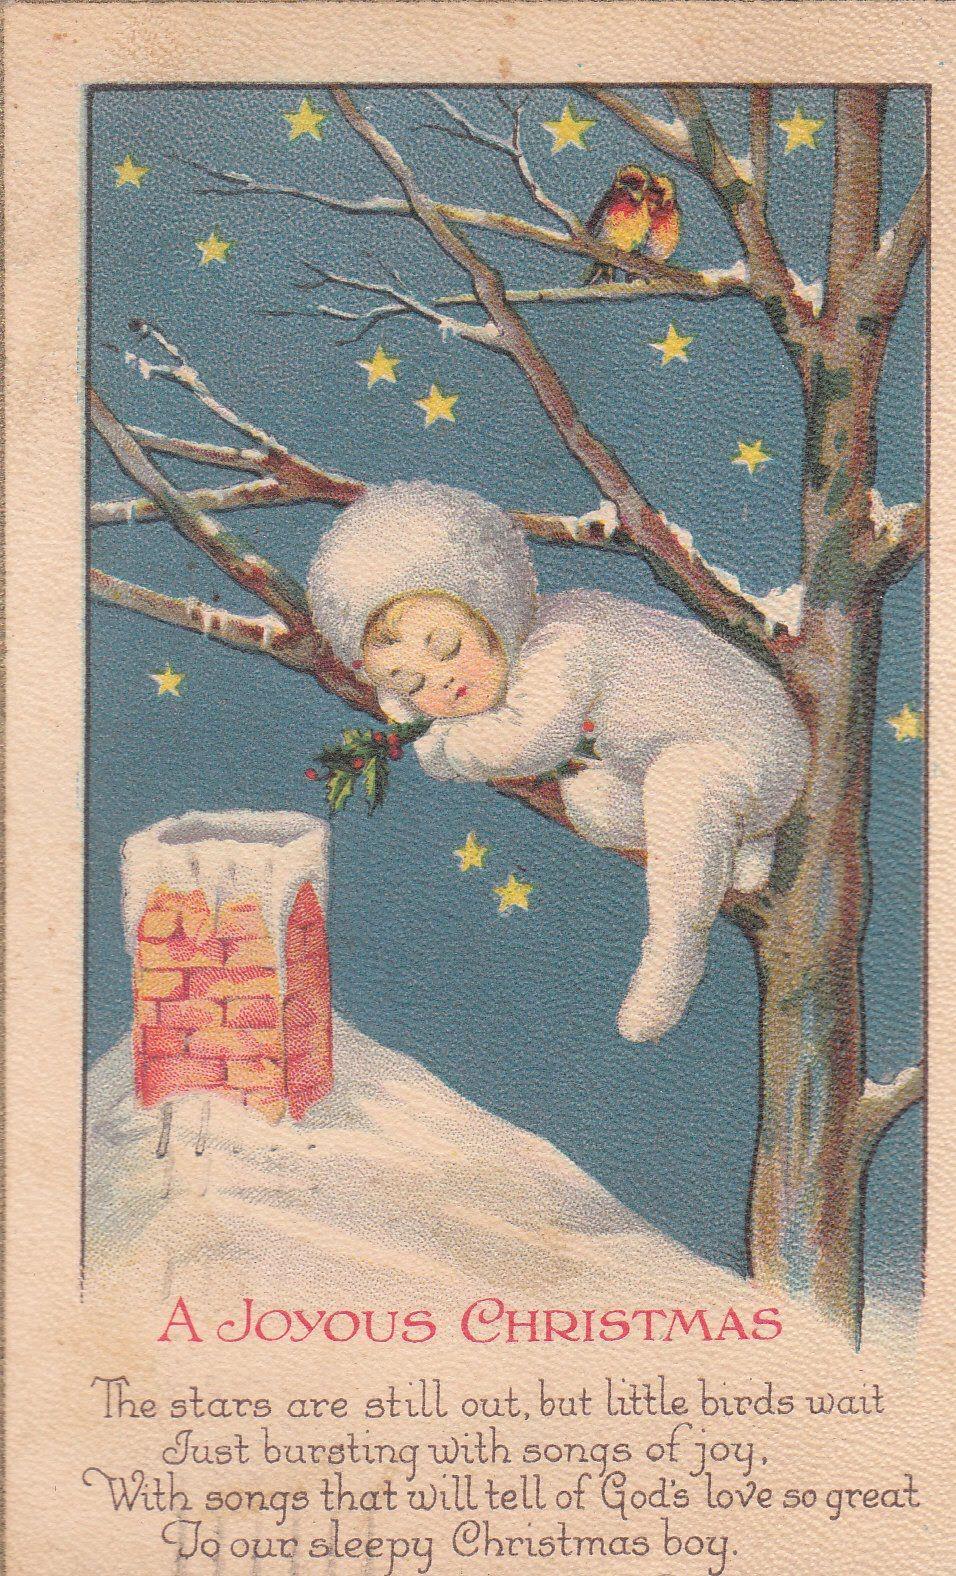 Antique Vintage Post Card Christmas Printable Picture Decor Vintage Christmas Cards Christmas Postcard Christmas Cards